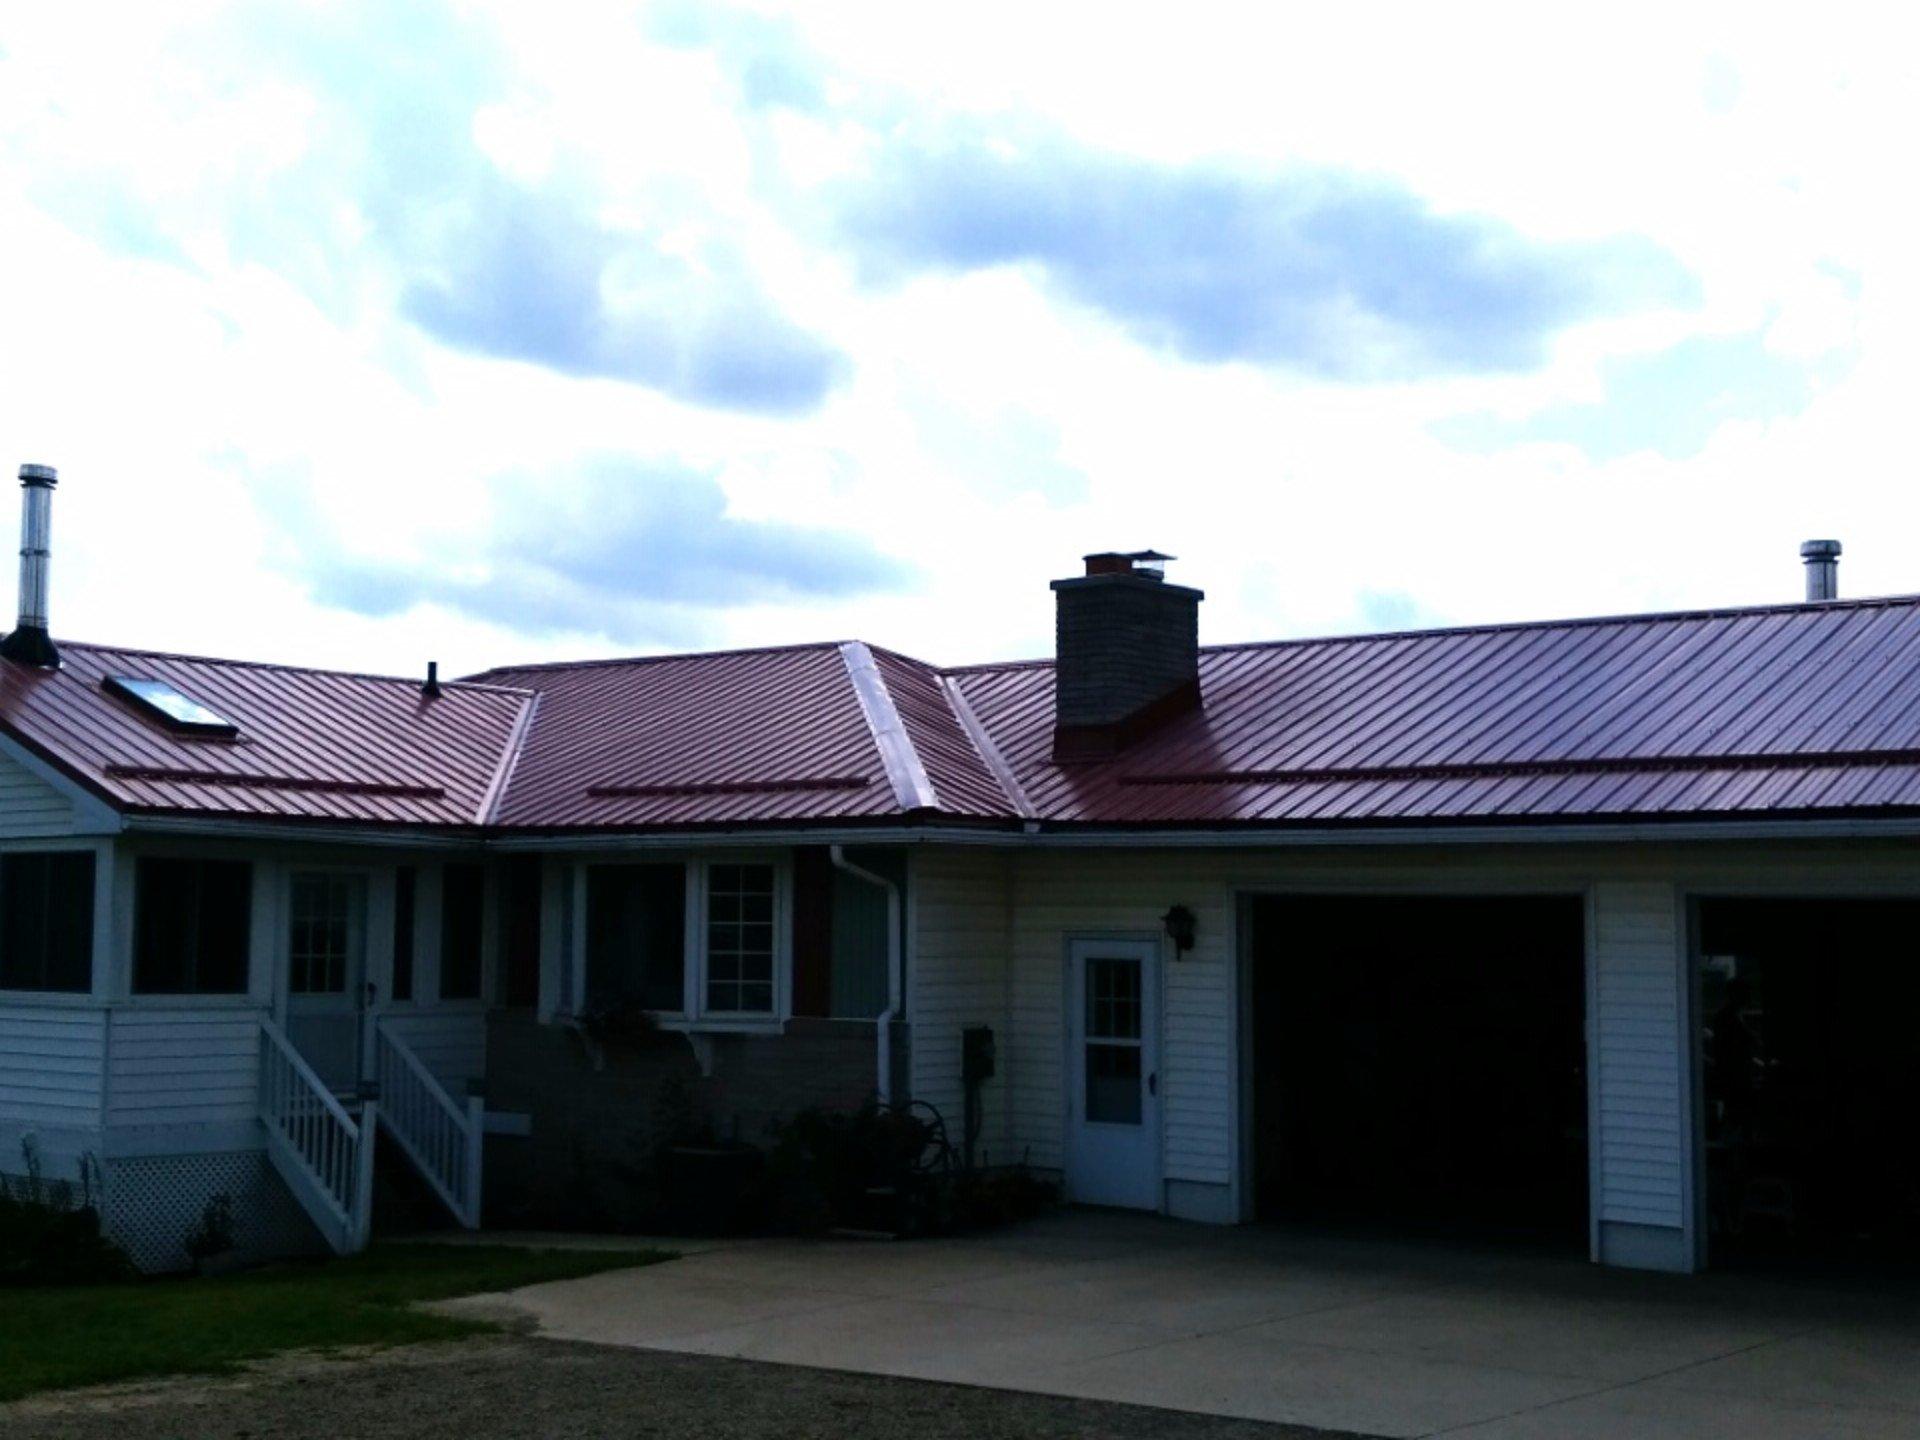 Gallery Roof Repair Contractors Erie Titusville